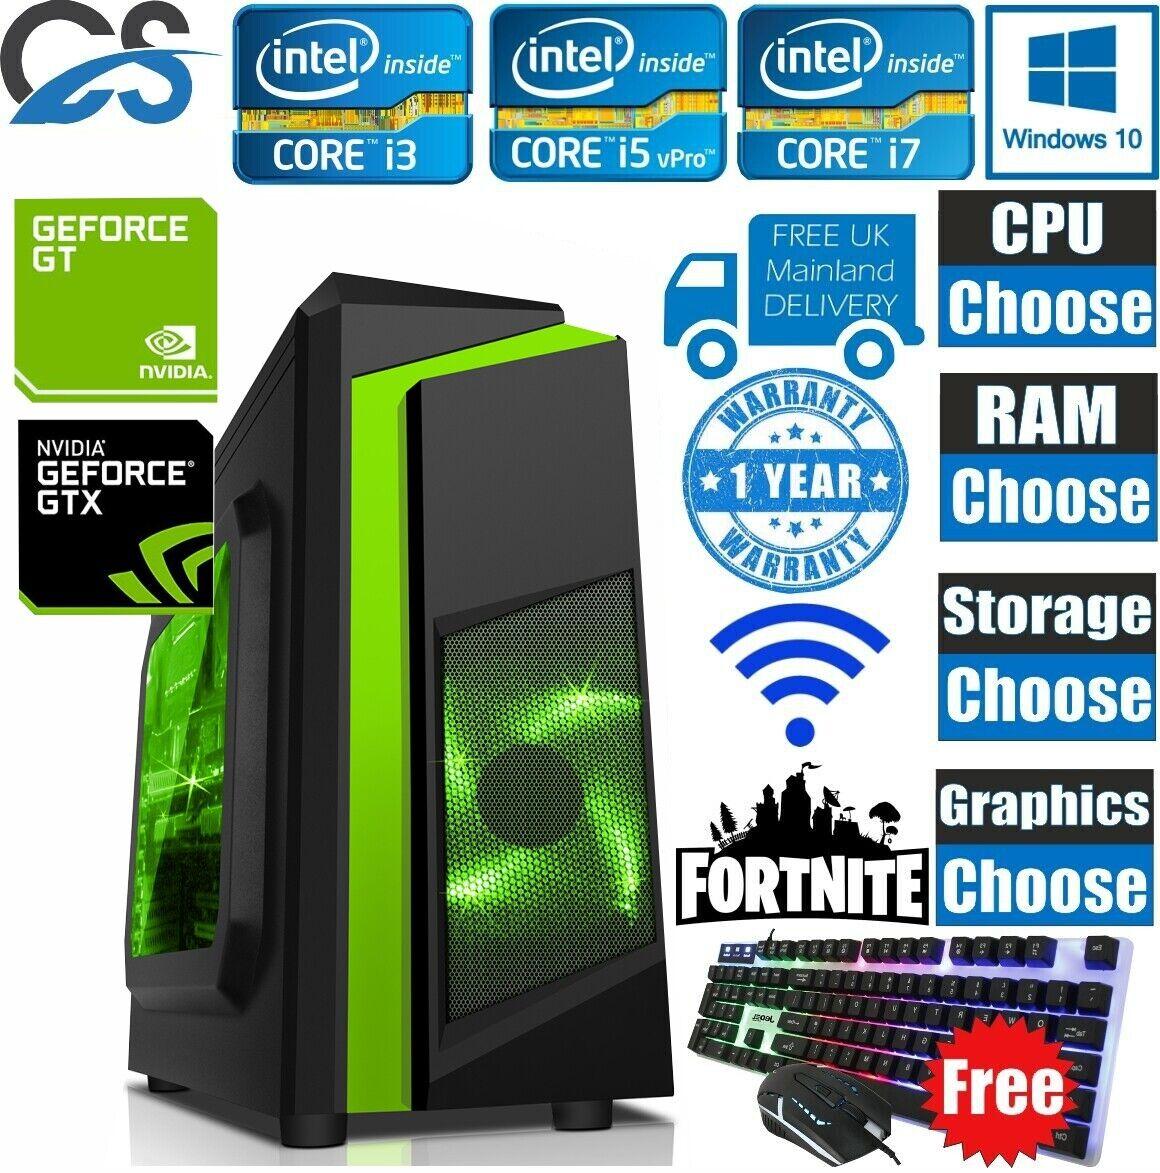 Computer Games - ULTRA FAST i3 i5 i7 Desktop Gaming Computer PC 2TB 16GB RAM GTX 1660 Windows 10